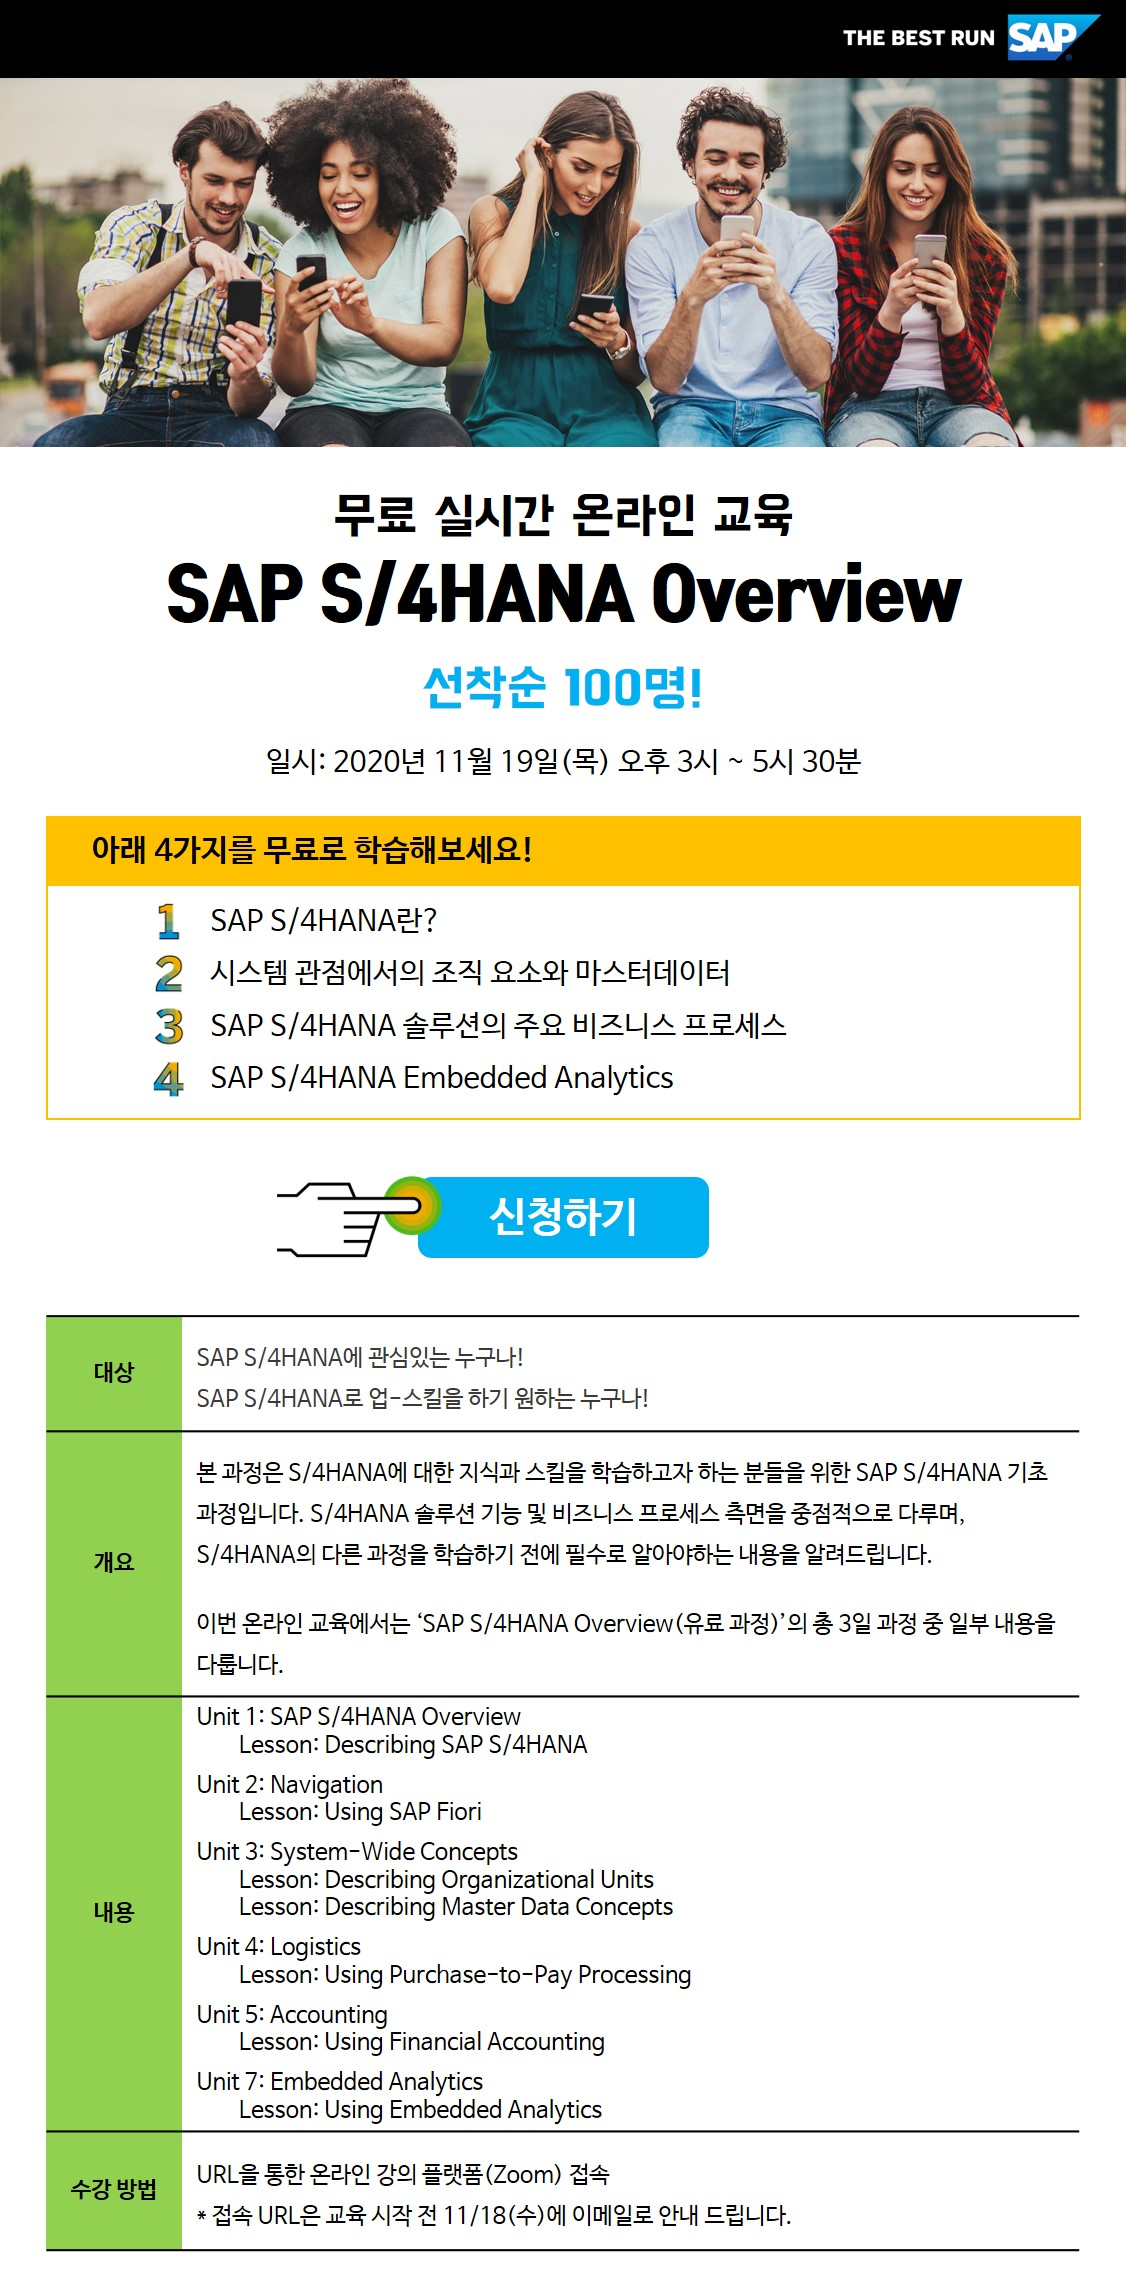 S4HANAOverview무료온라인과정_v.3.